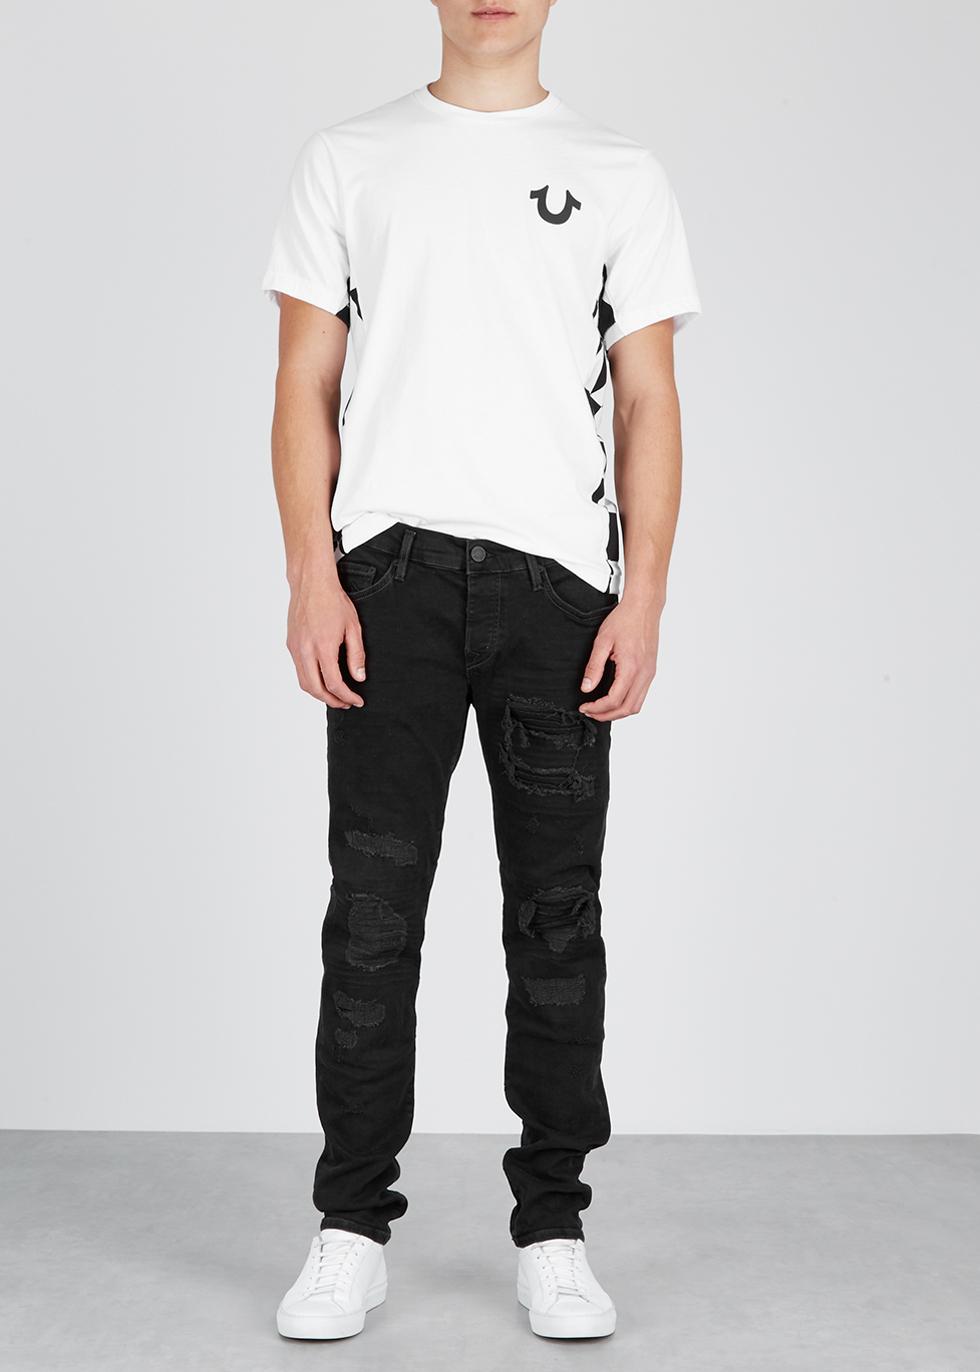 White printed cotton T-shirt - True Religion